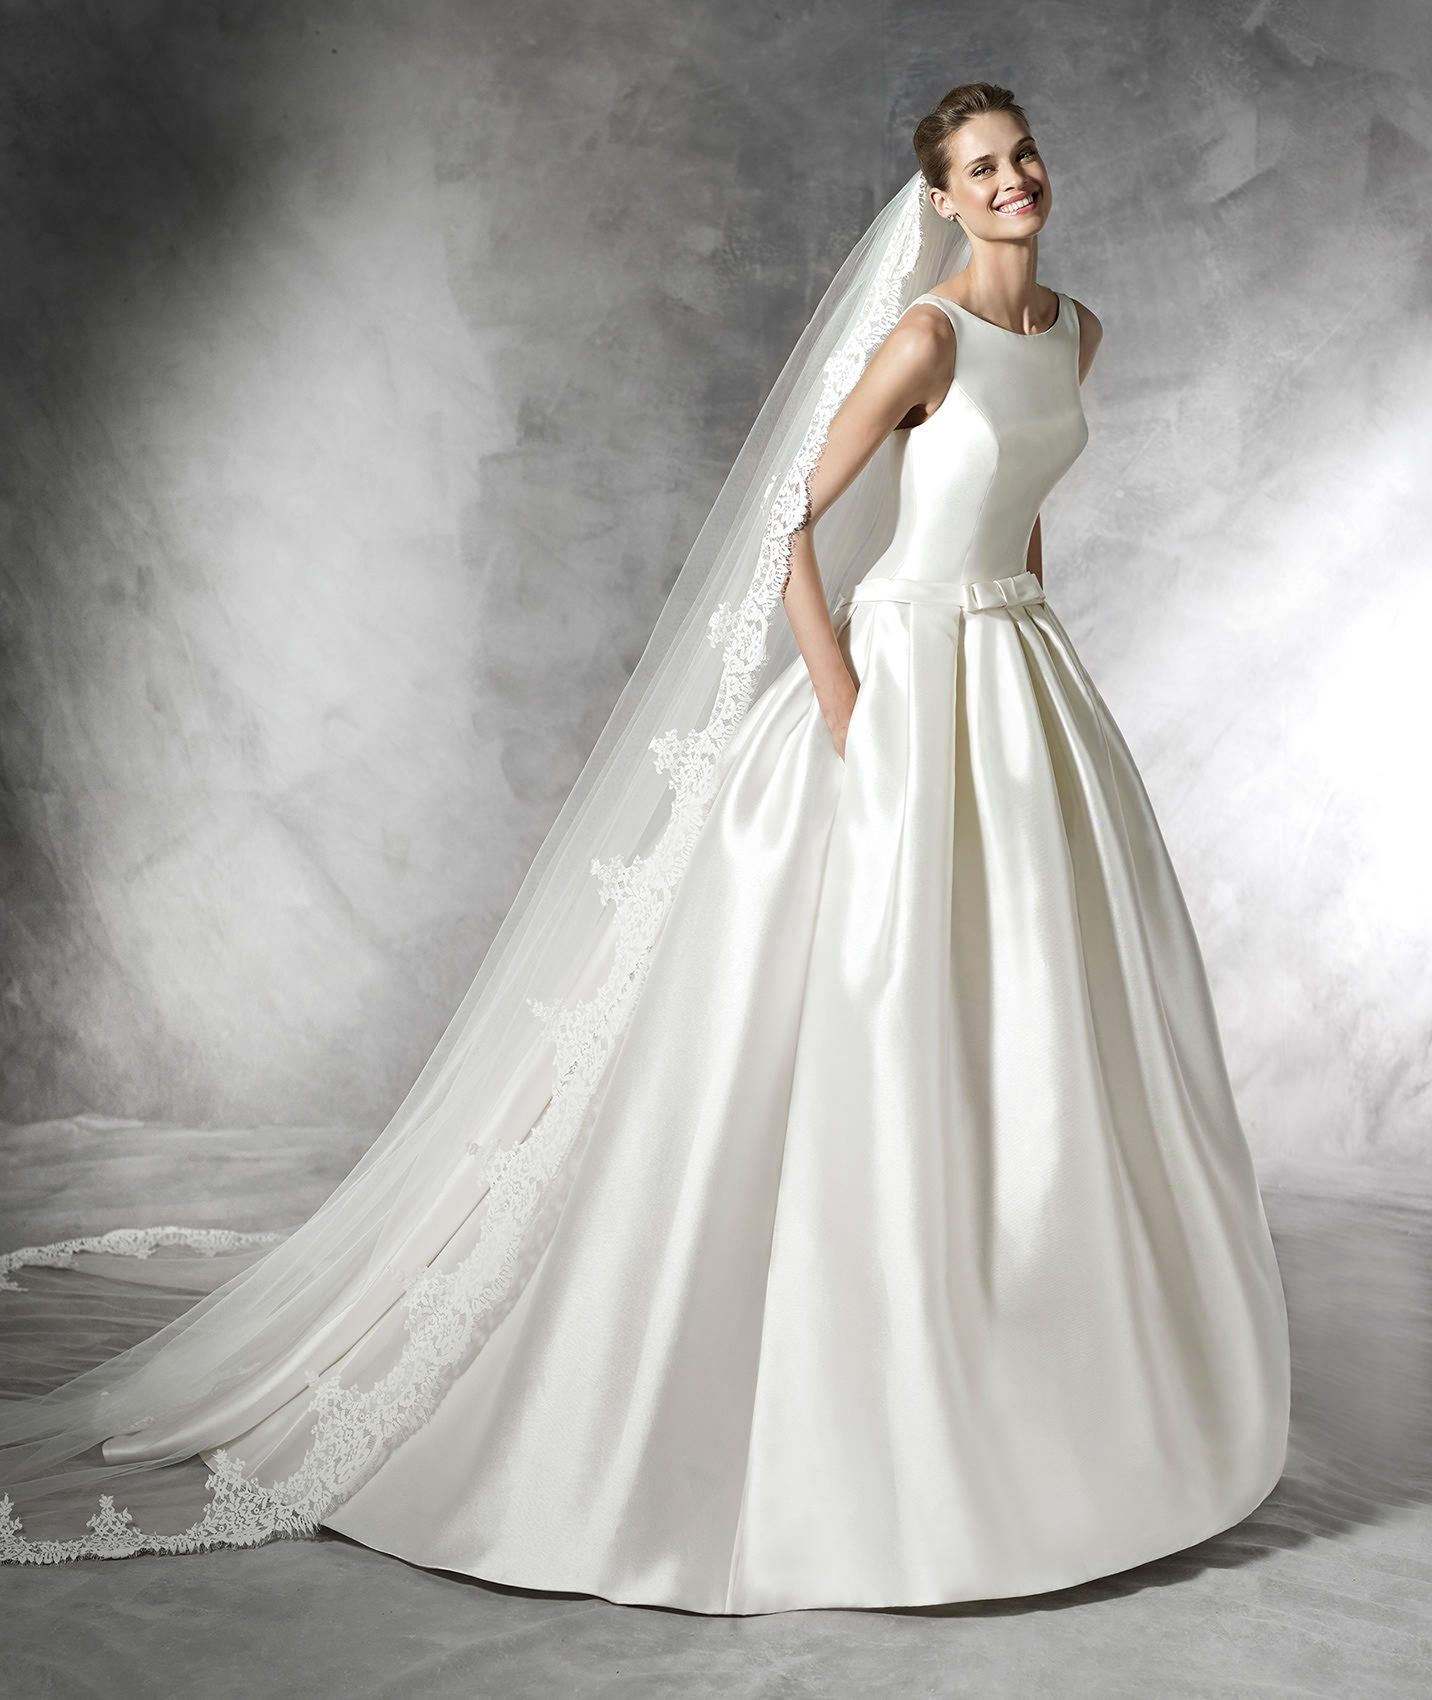 Brautkleid Formen: Princess Bateau Sleeveless Taffeta Wedding Dress With